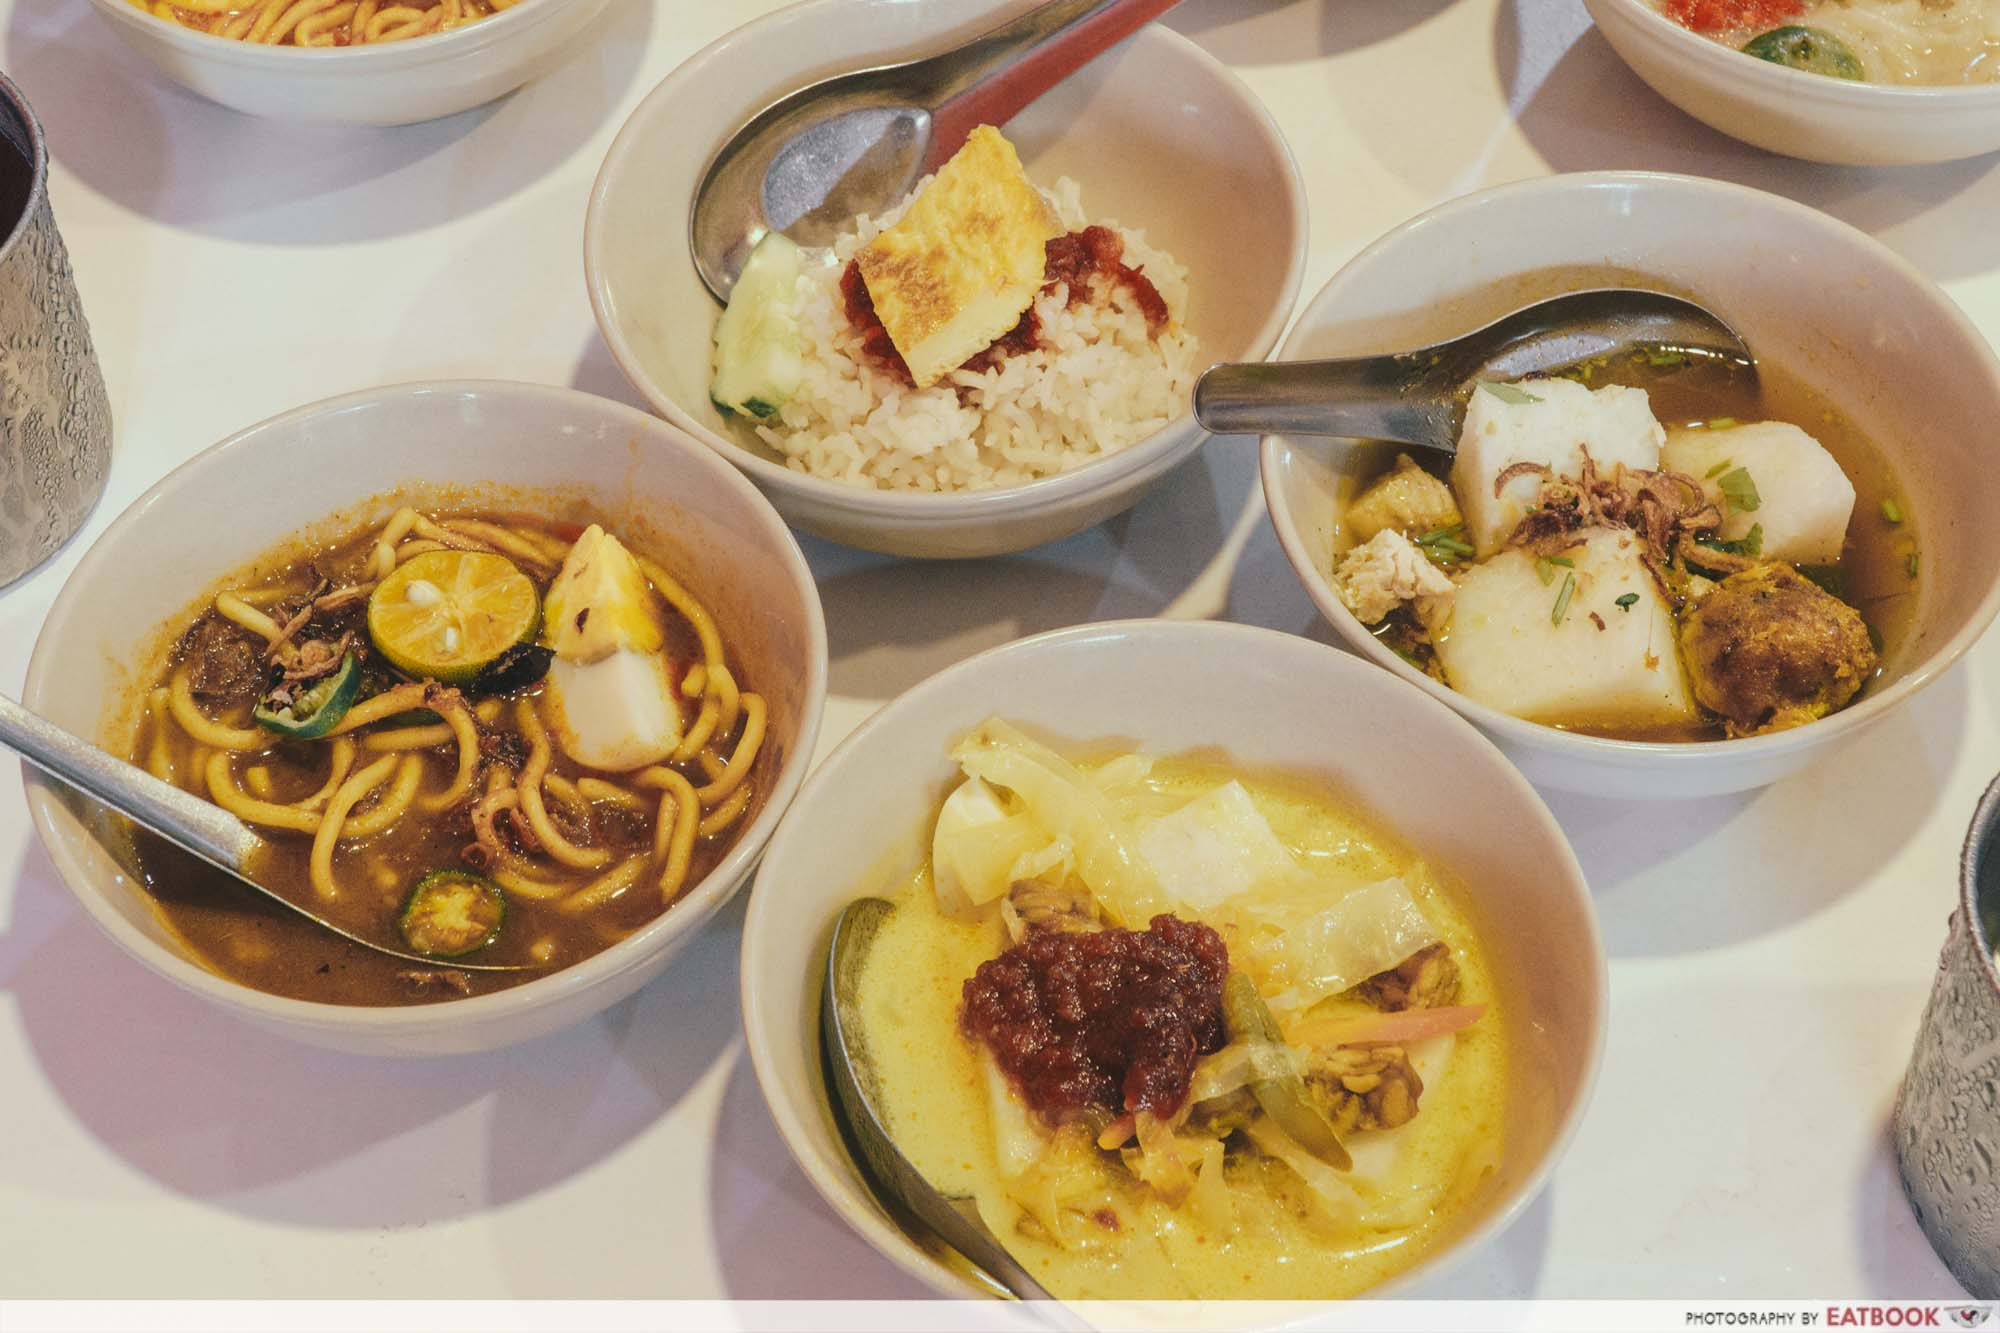 Johor Bahru Hawker Food - Lontong Mee Rebus Nasi Lemak Soto